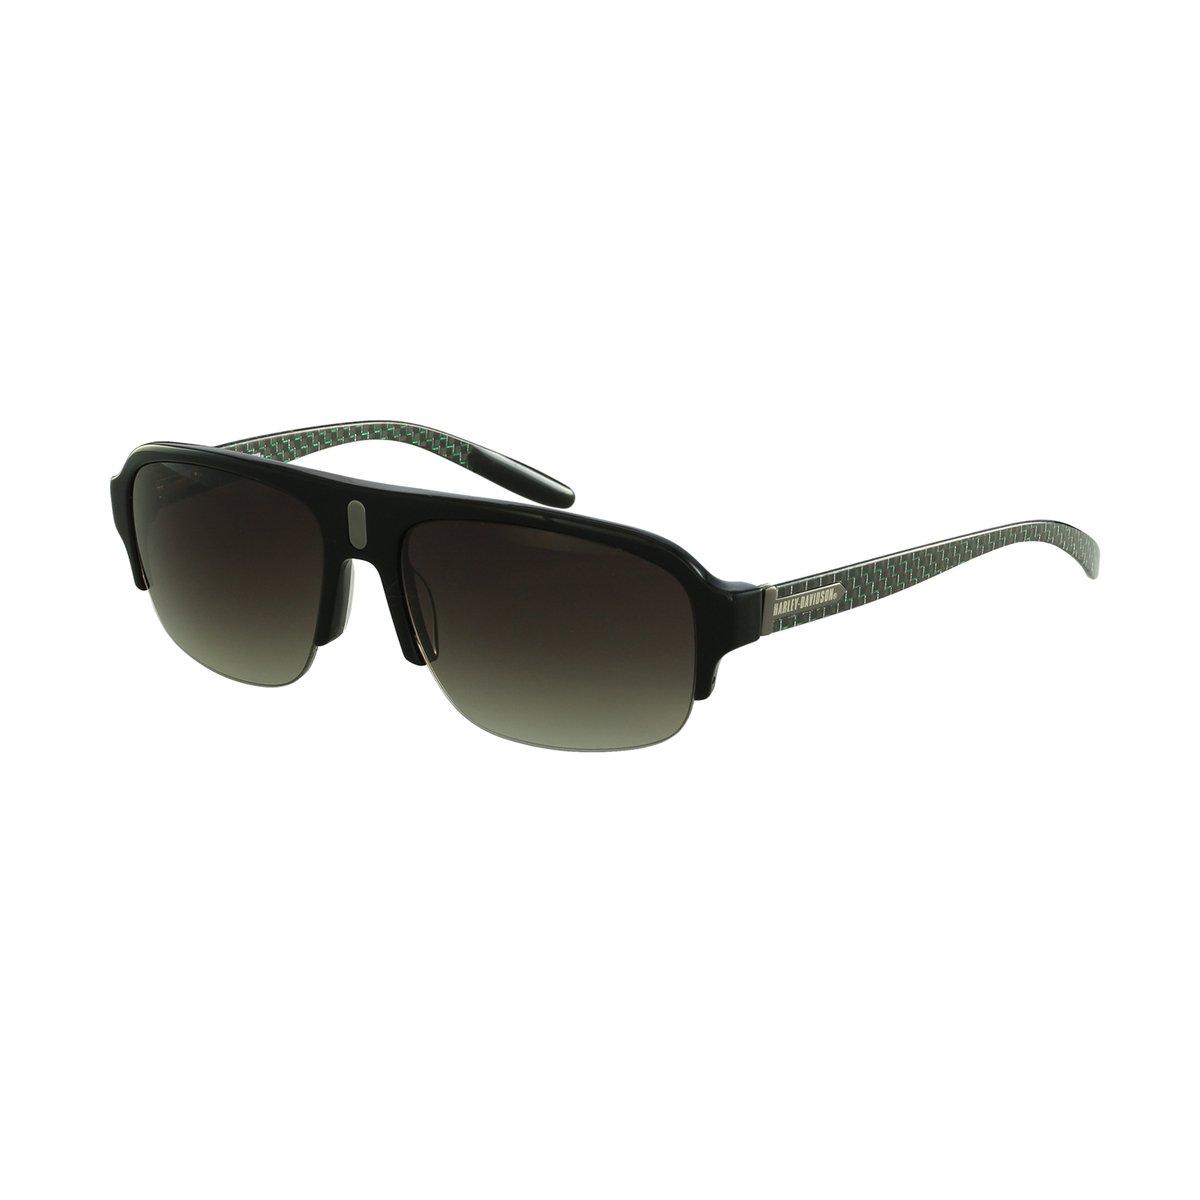 Óculos de Sol Harley Davidson Casual Preto - Compre Agora   Zattini 5fce4aace3